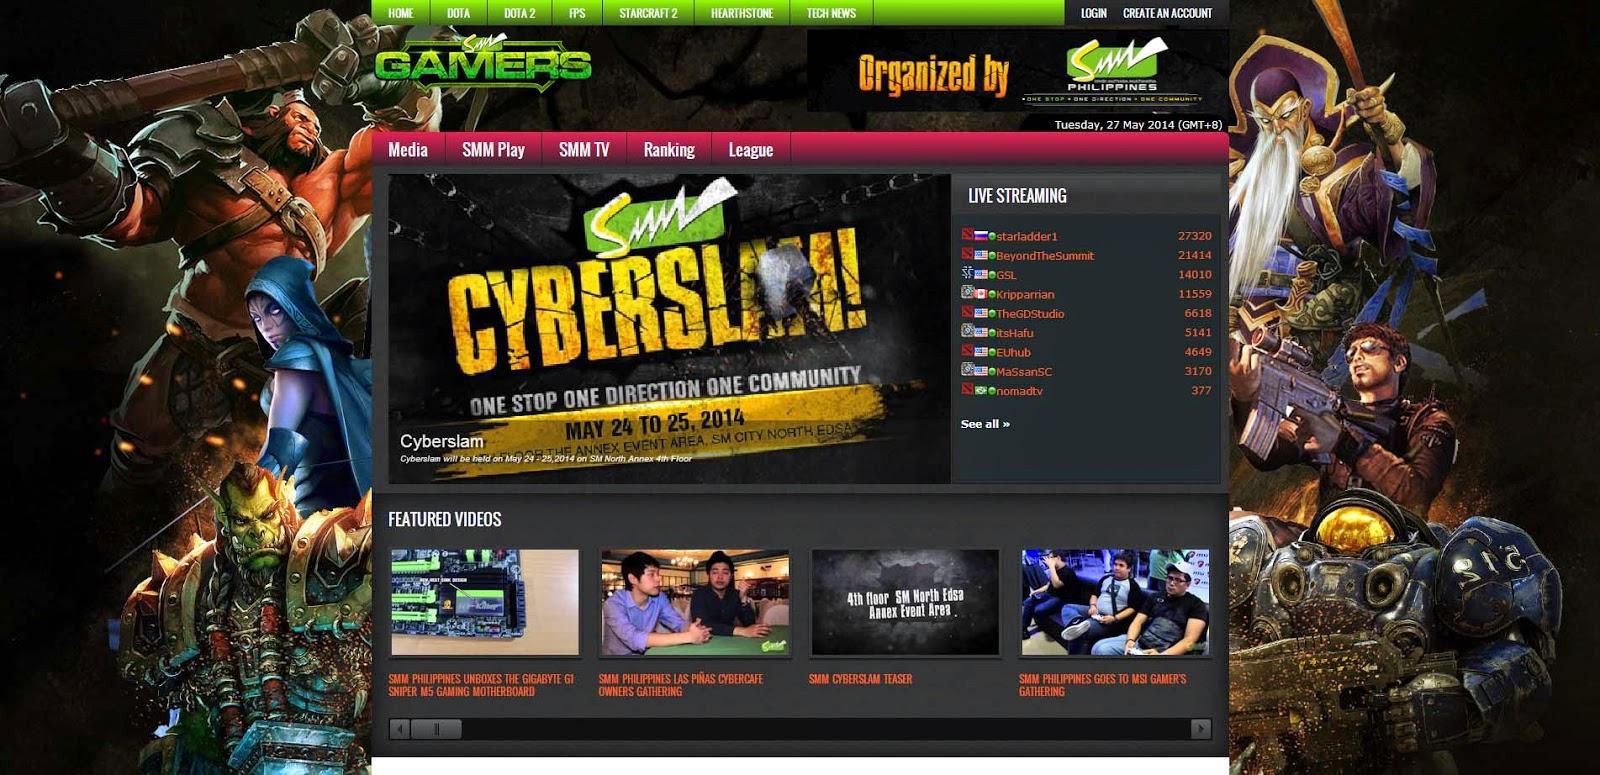 SMM Gamers Web Portal